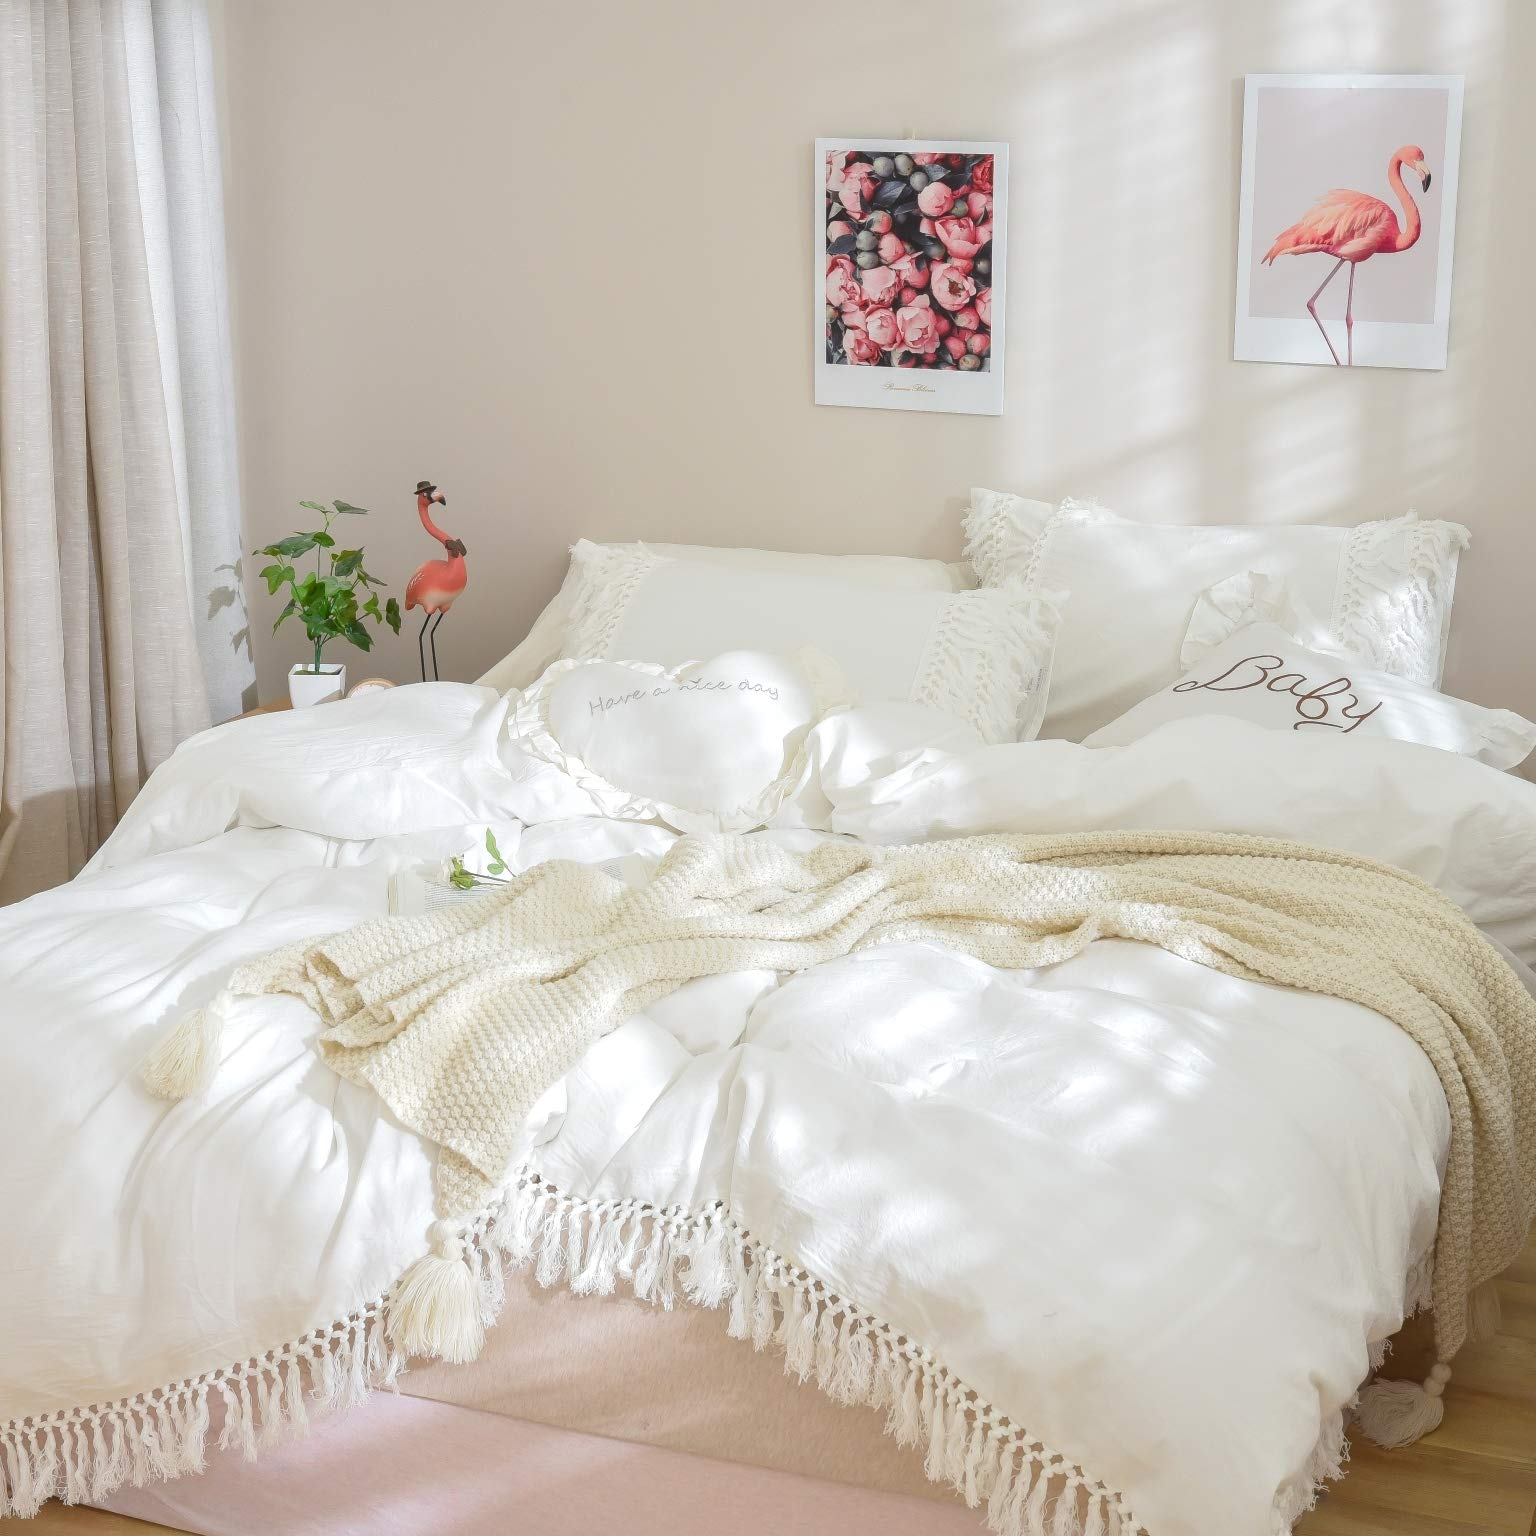 Softta Boho Bedding Tassel Duvet Cover Fringed Twin 3 Pcs 100% Washed Cotton Vintage and Elegant Ruffle Duvet Covers White